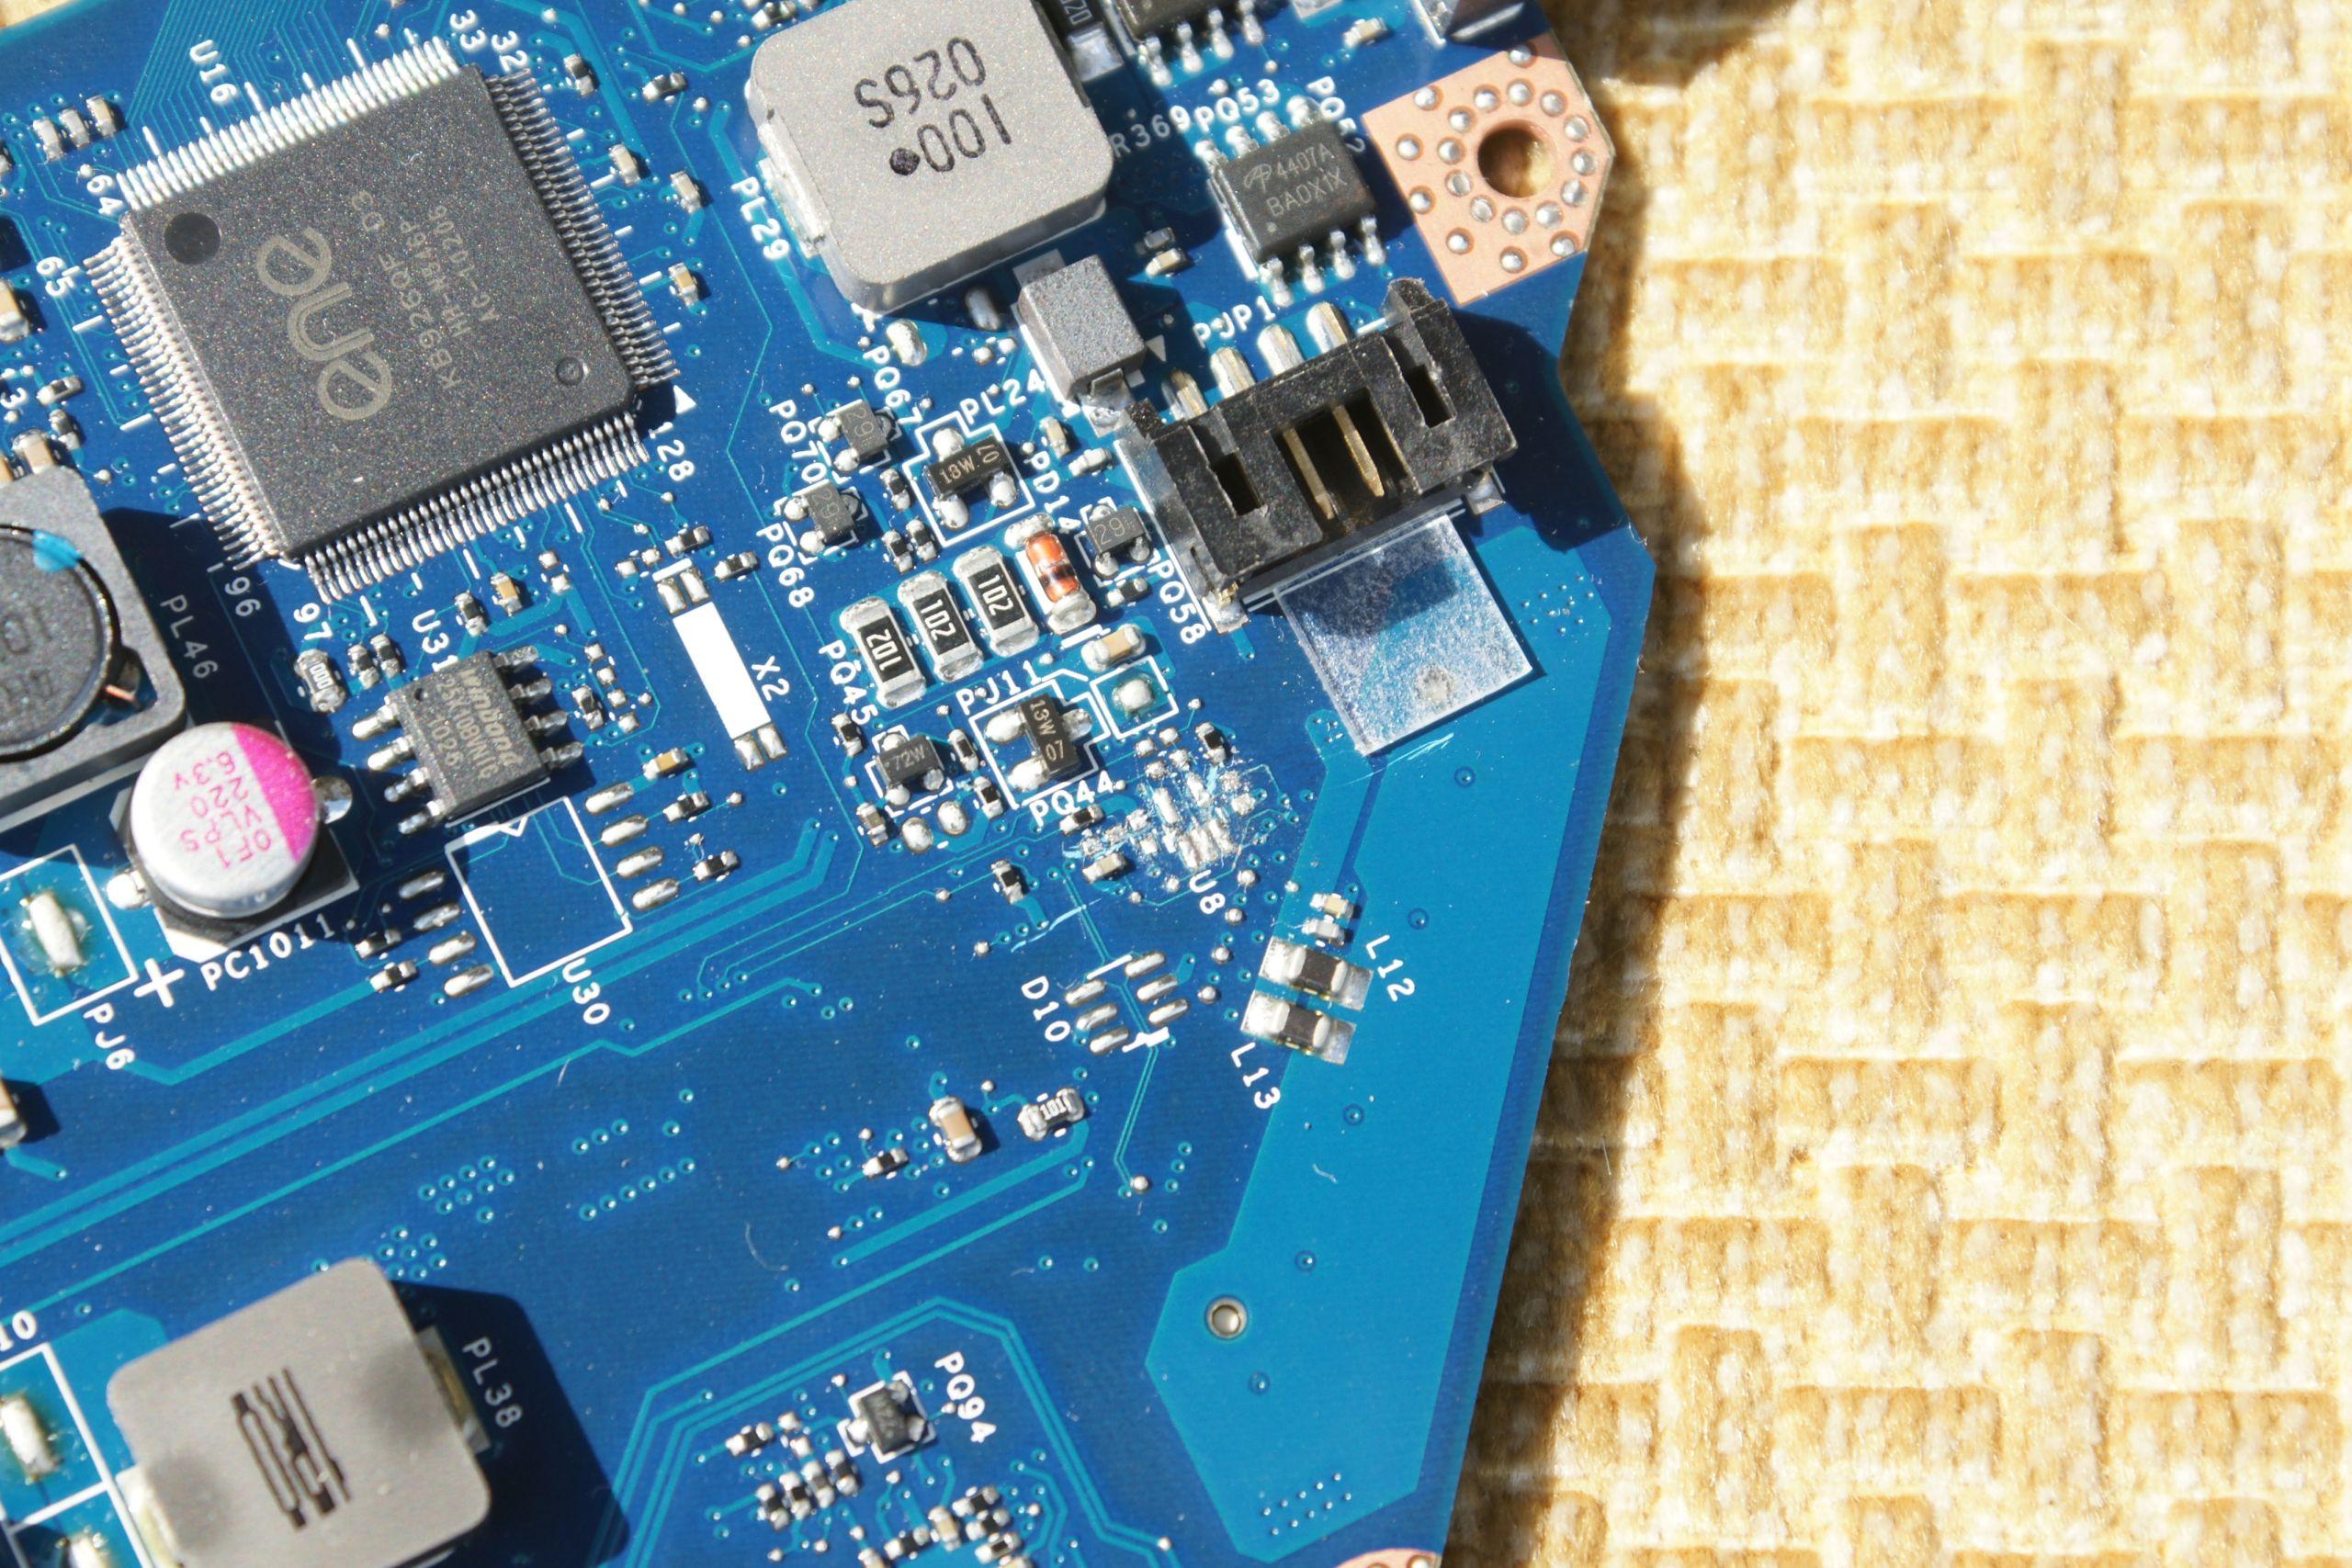 Acer 5742Z - Uruchamia si� i reset, brakuj�ce elementy.